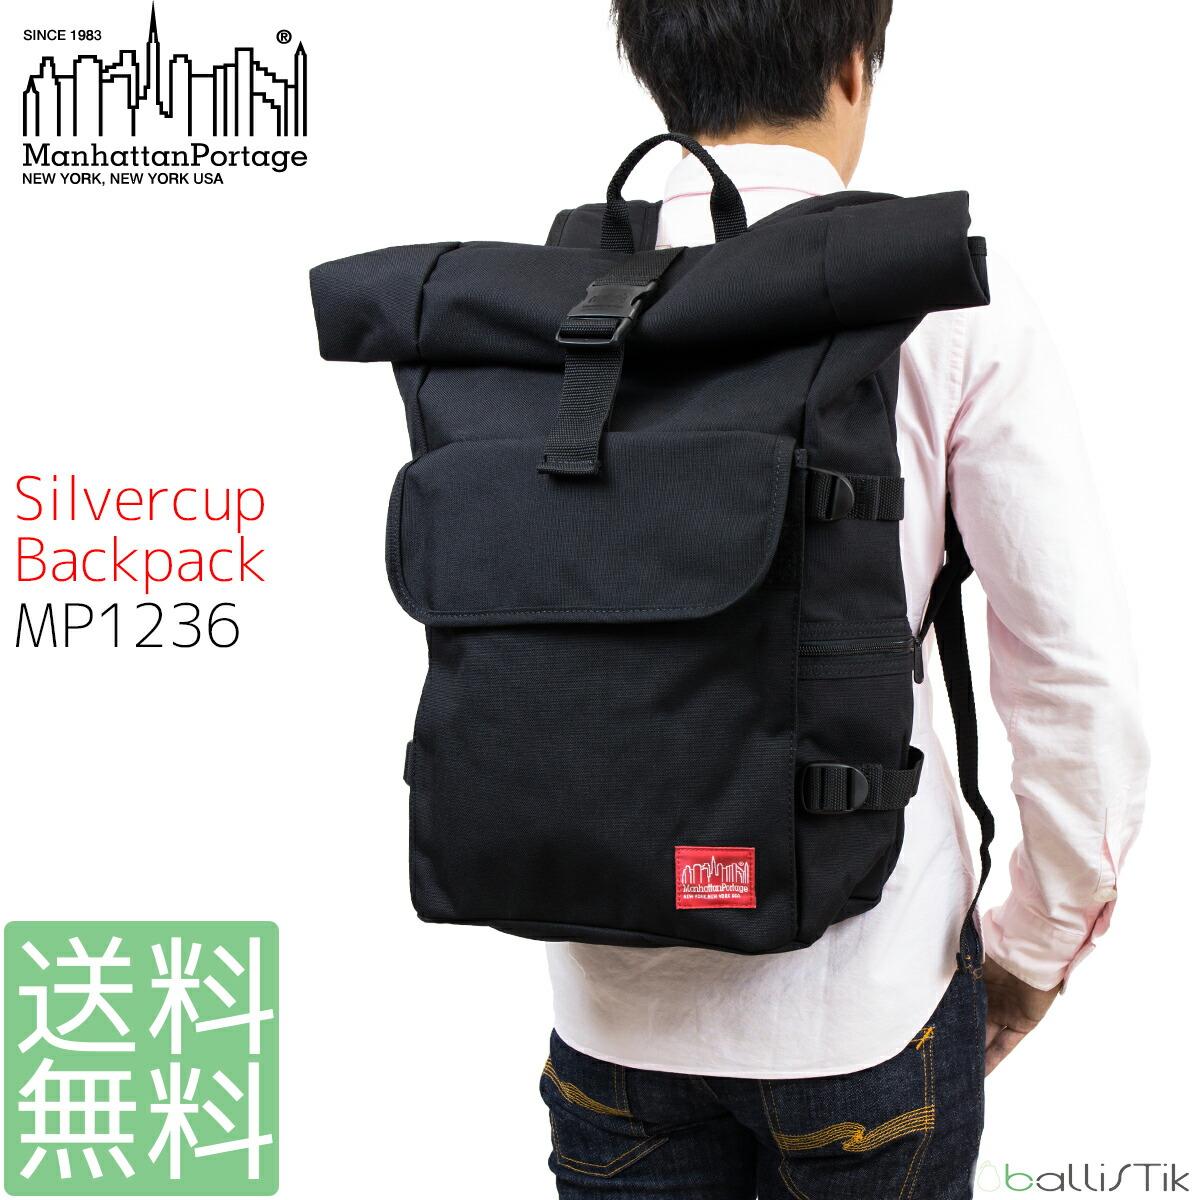 Manhattan Portage_リュック_バックパック_Silvercup Backpack_シルバーカップバックパック_MP1236